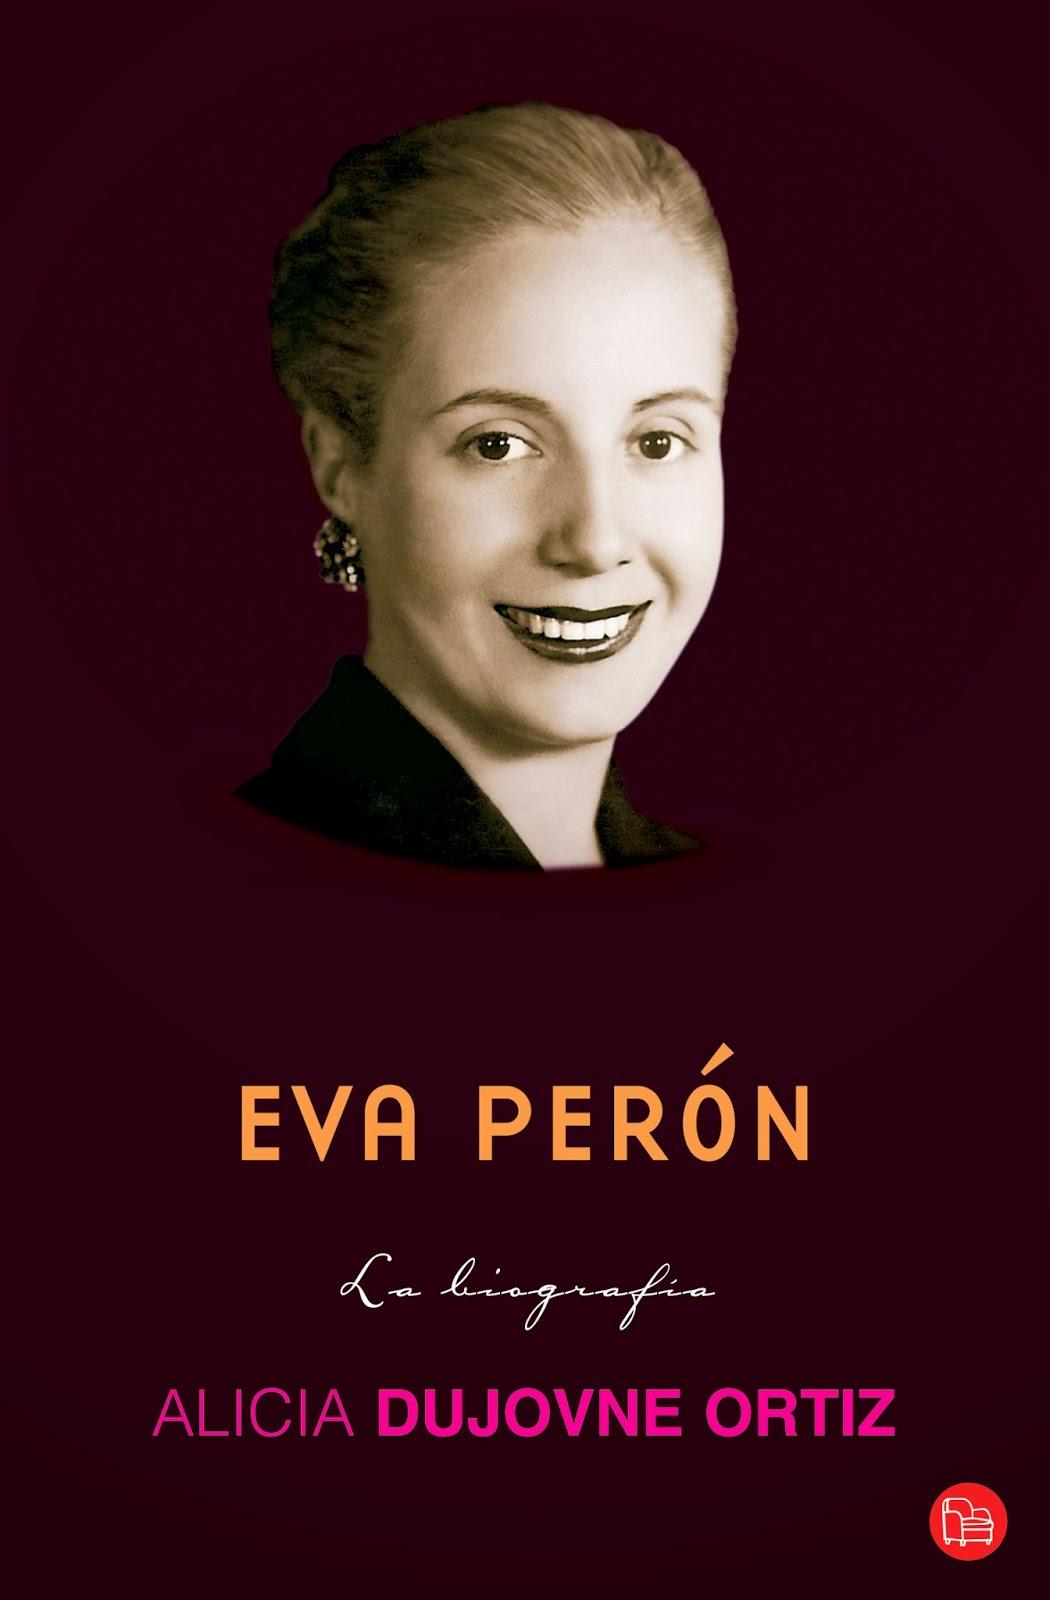 Eva Perón, la biografía, de Alícia Dujovne Ortiz